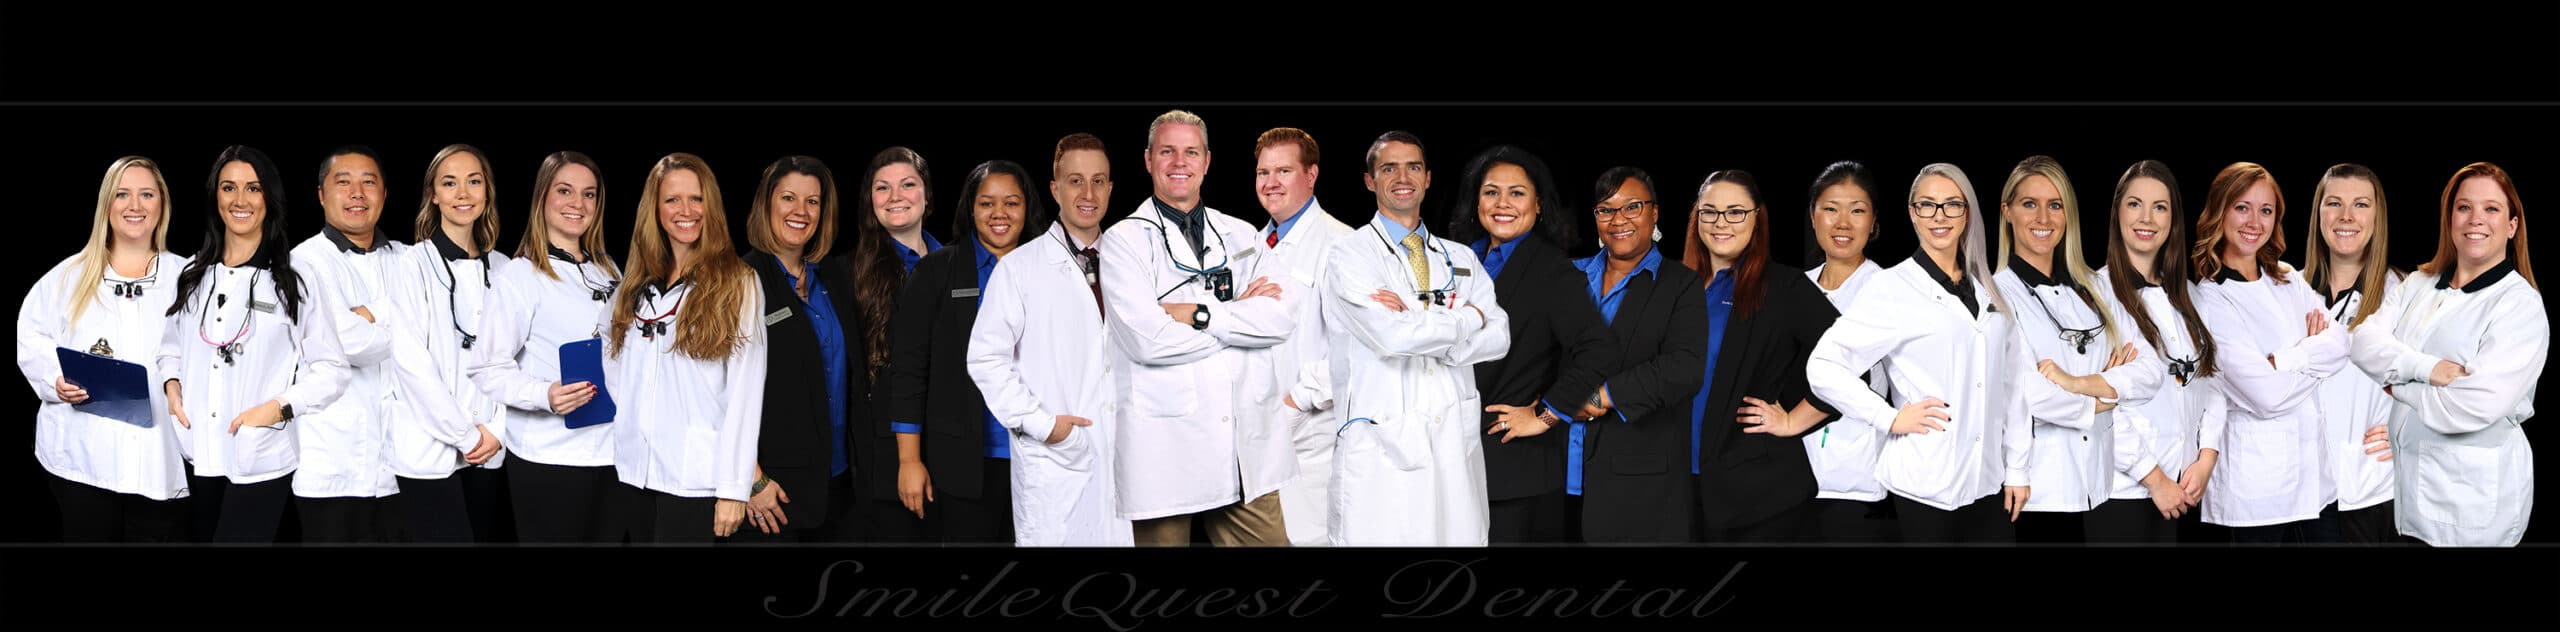 Our Team | Smile Quest Dental